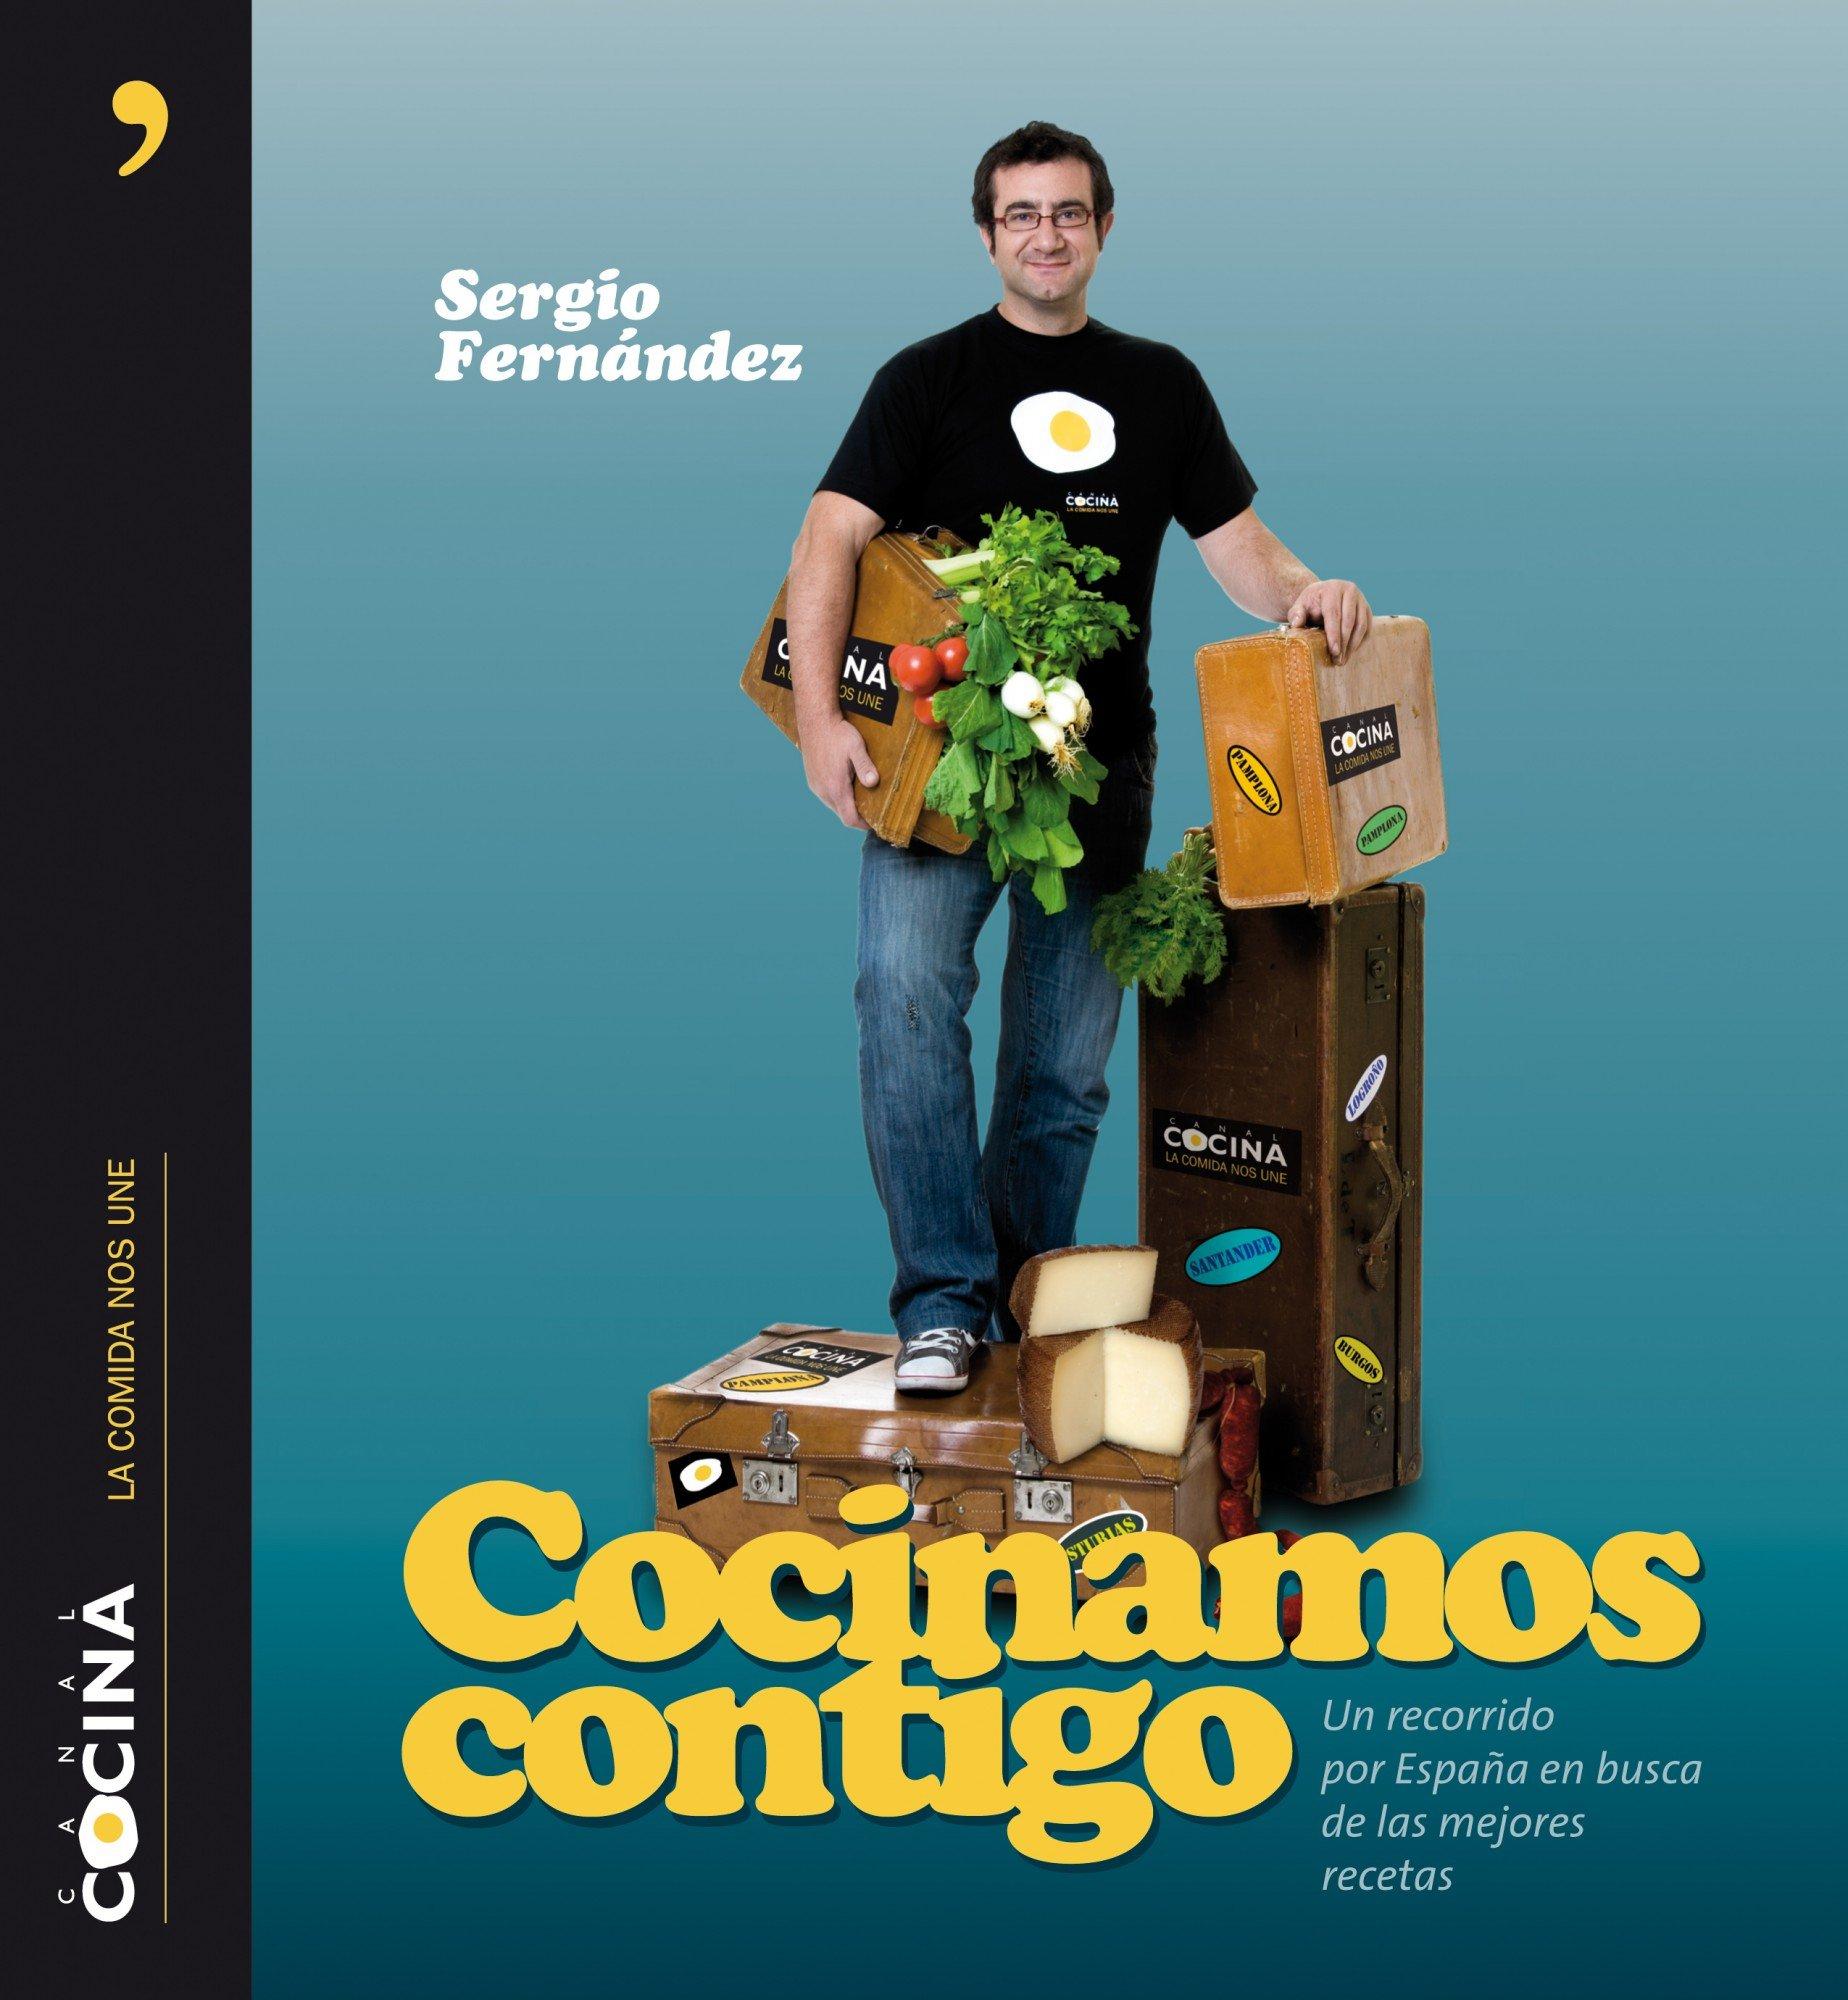 Cocina Sergio Fernandez | Cocinamos Contigo Sergio Fernandez Canal Cocina 9788484609605